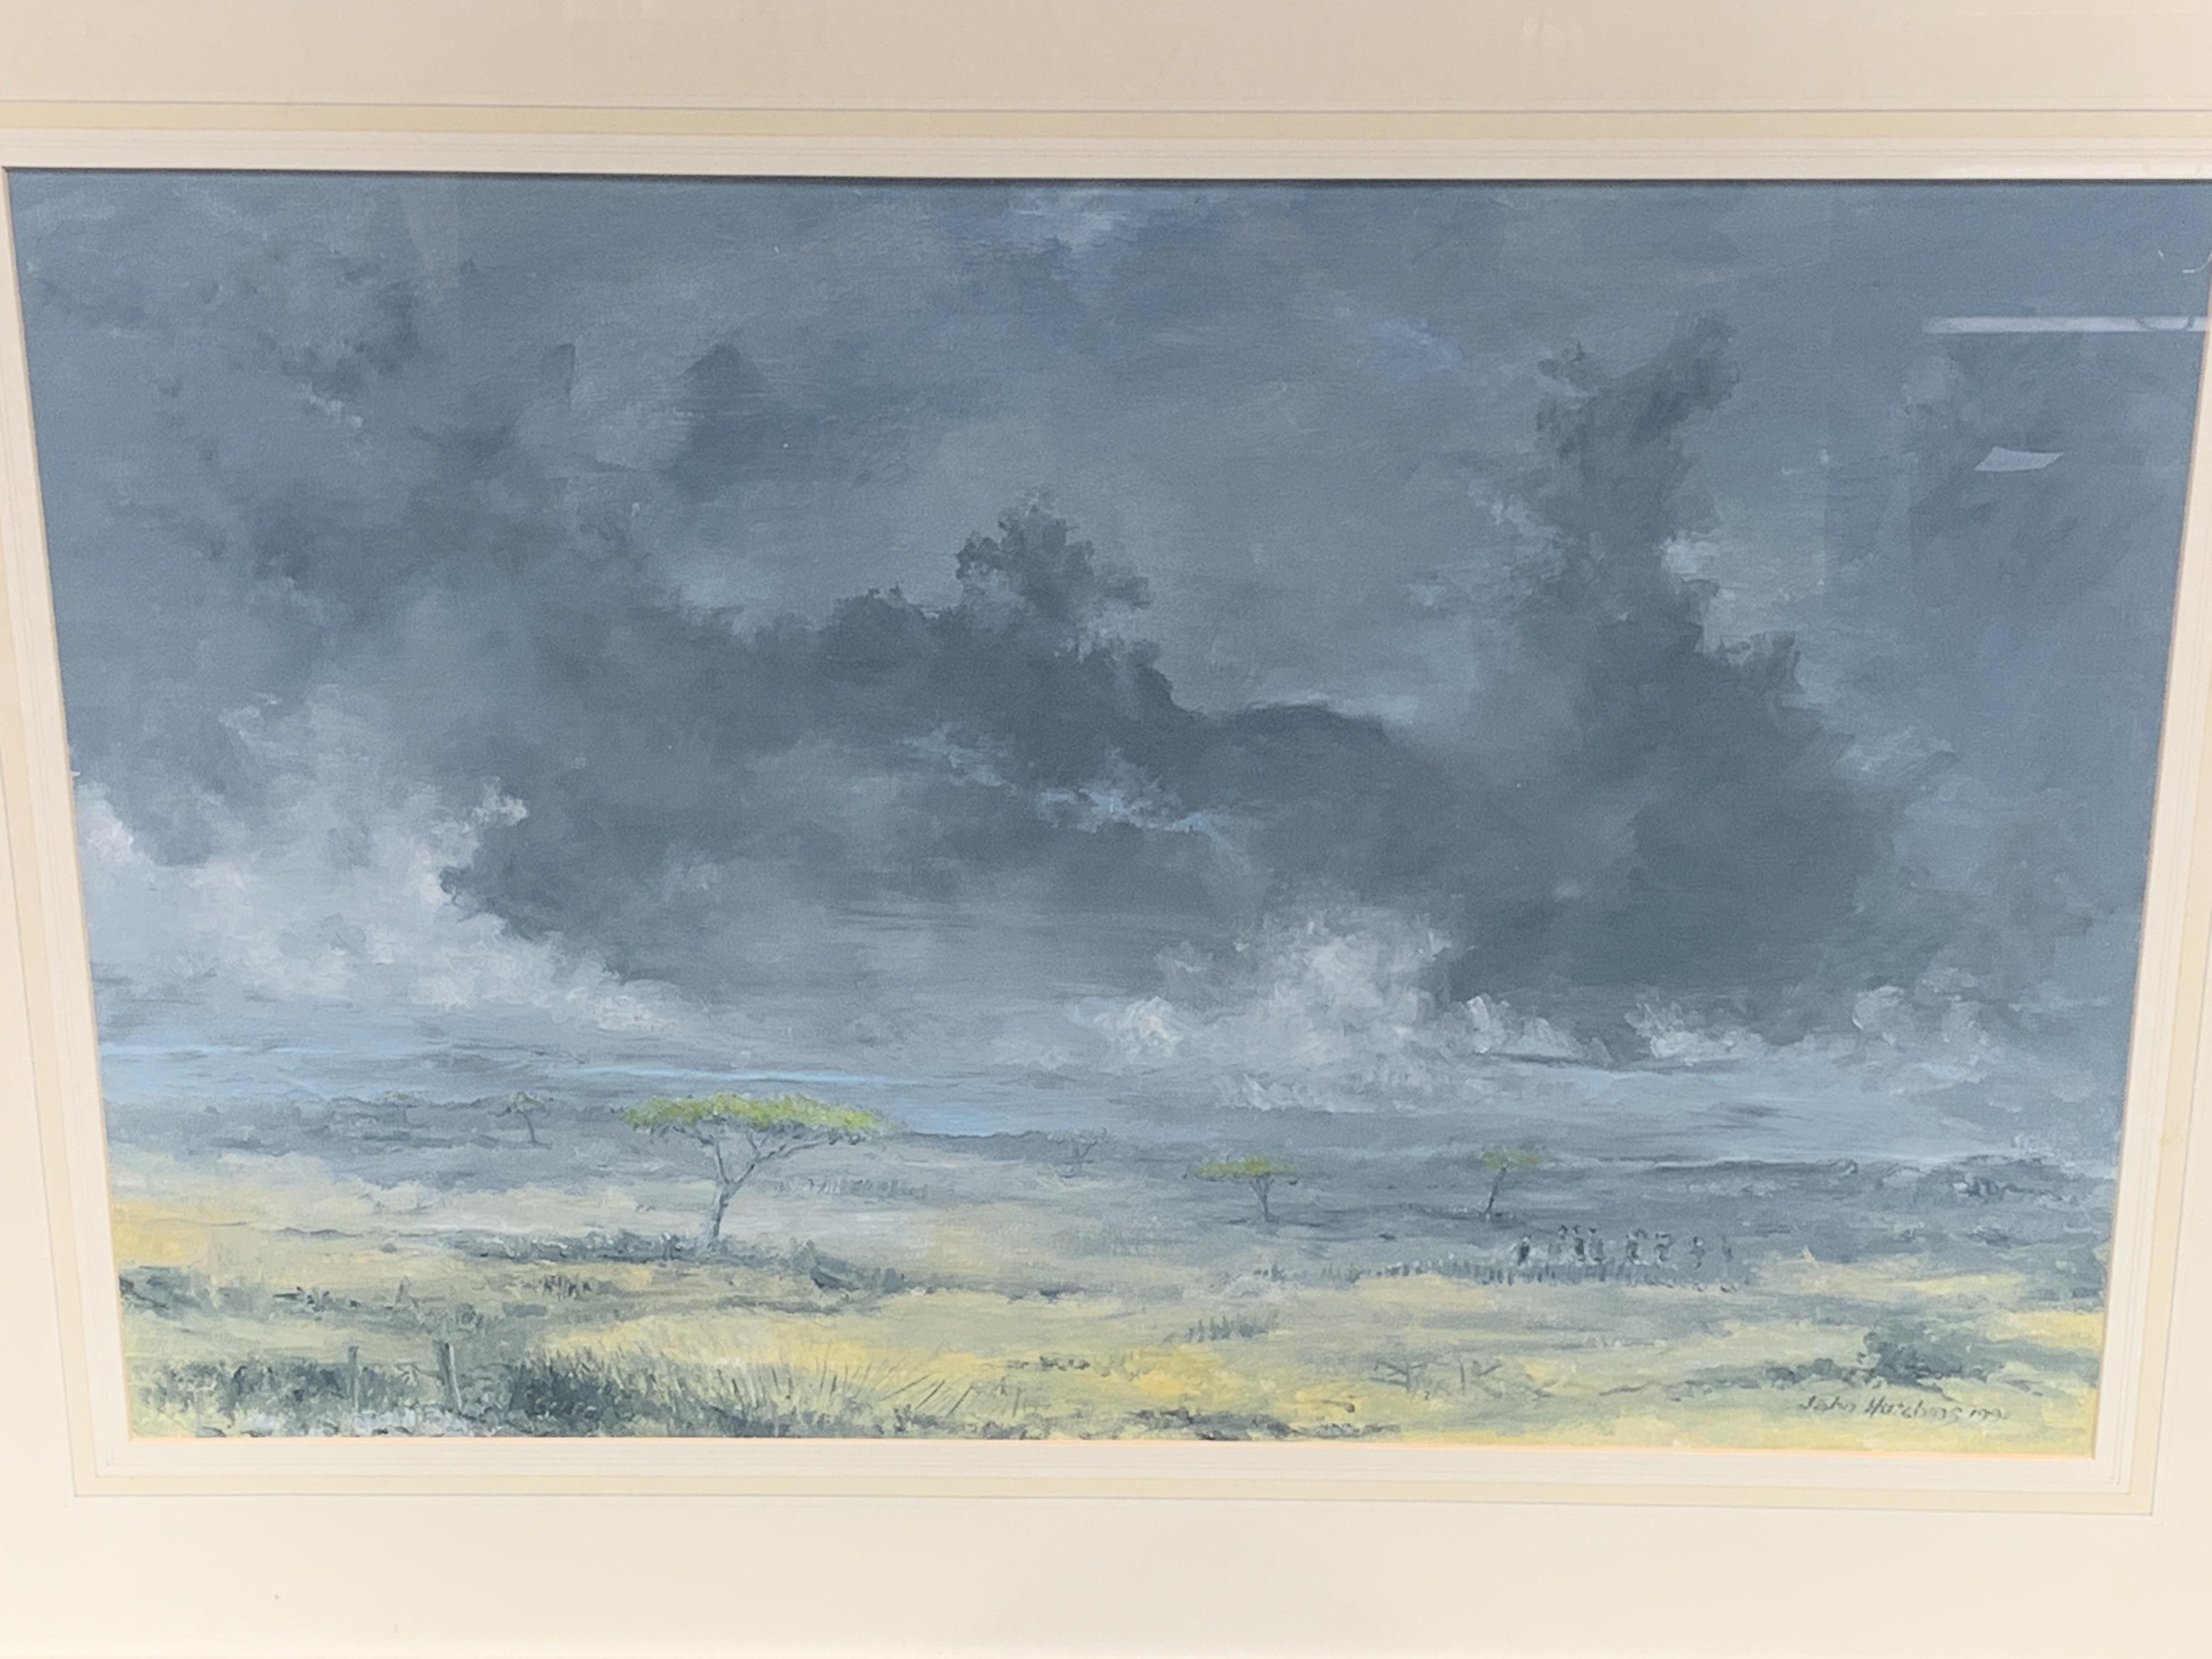 Framed oil on canvas signed John Hutchins - Image 2 of 3